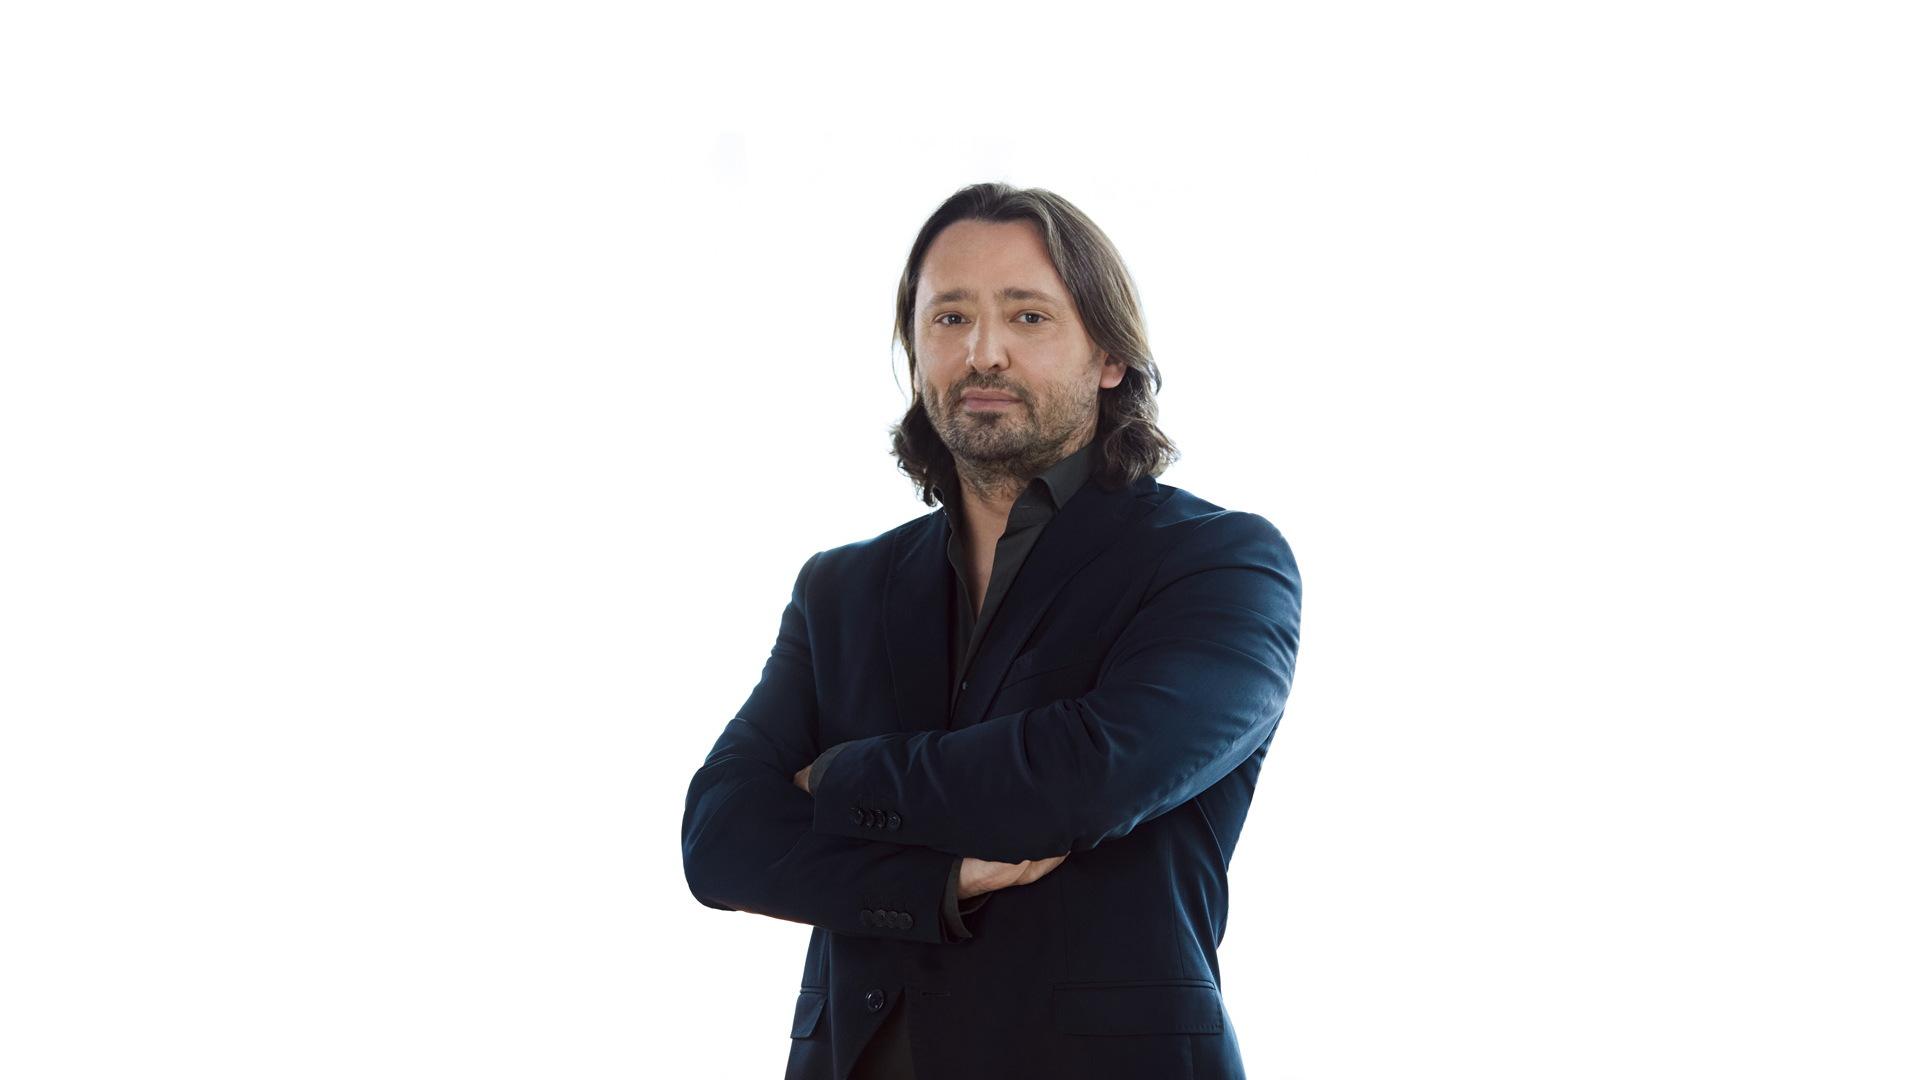 Jozef Kaban